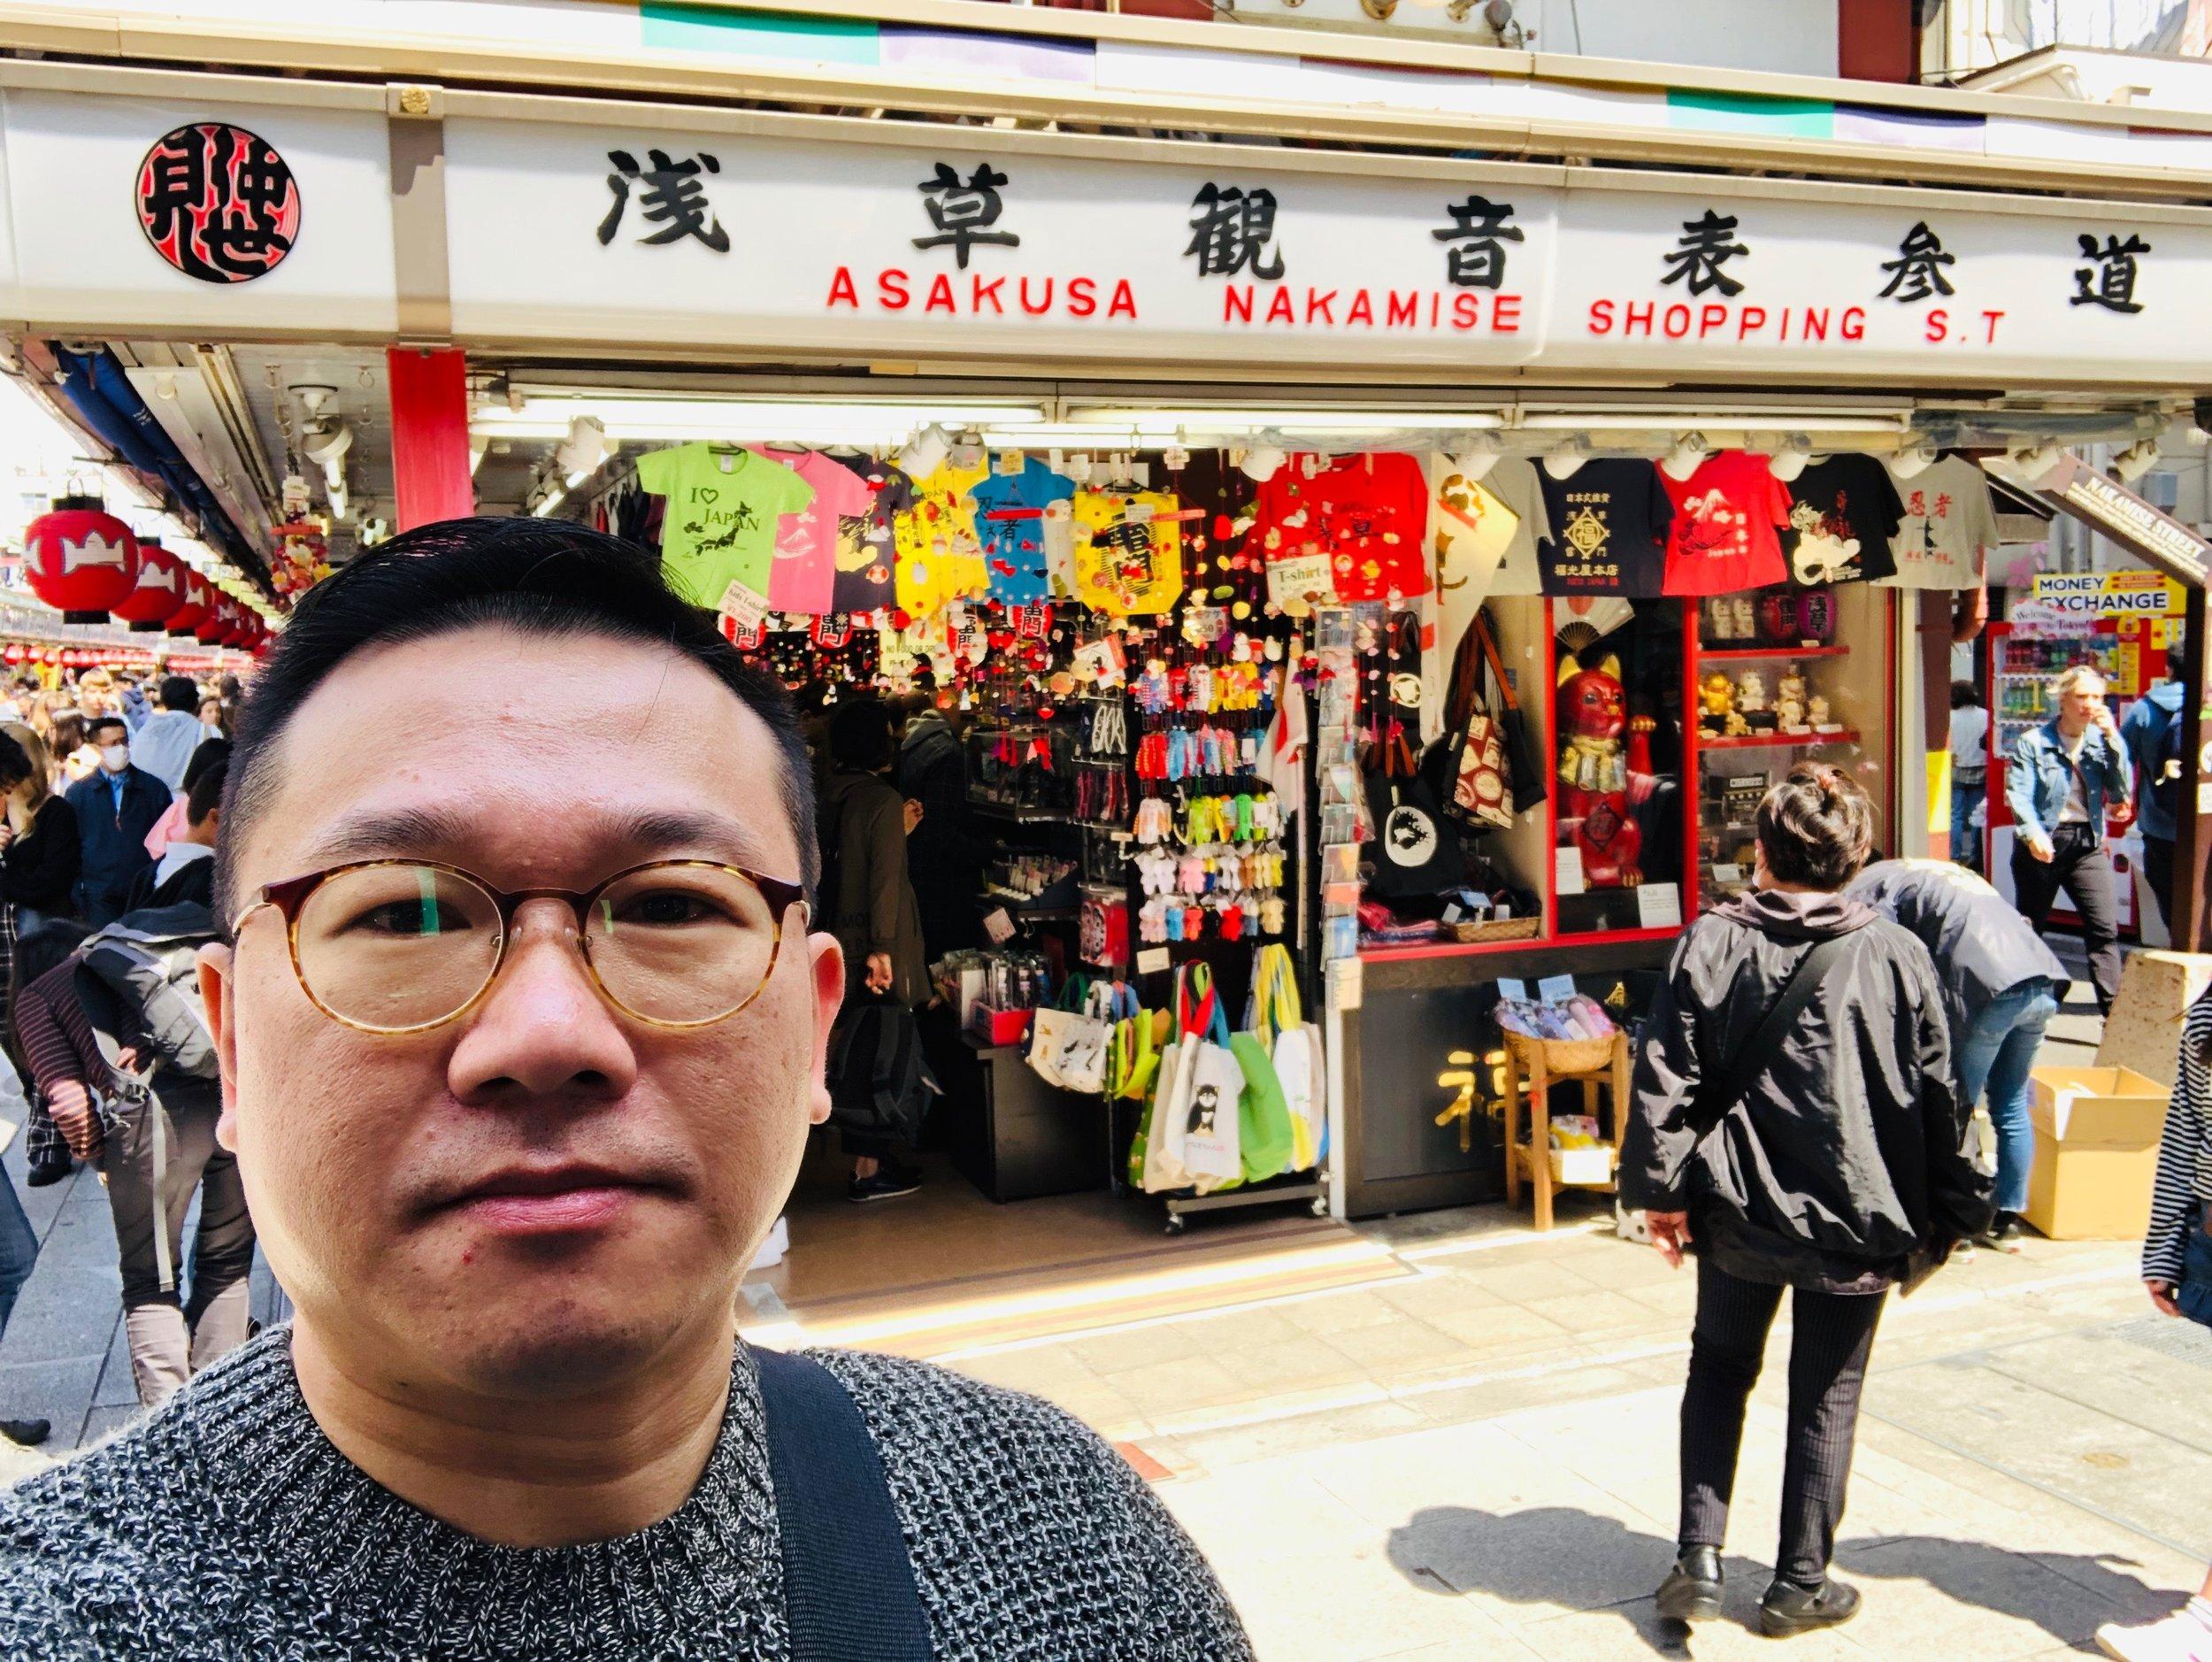 Selfie time at Asakusa Nakamise Dori